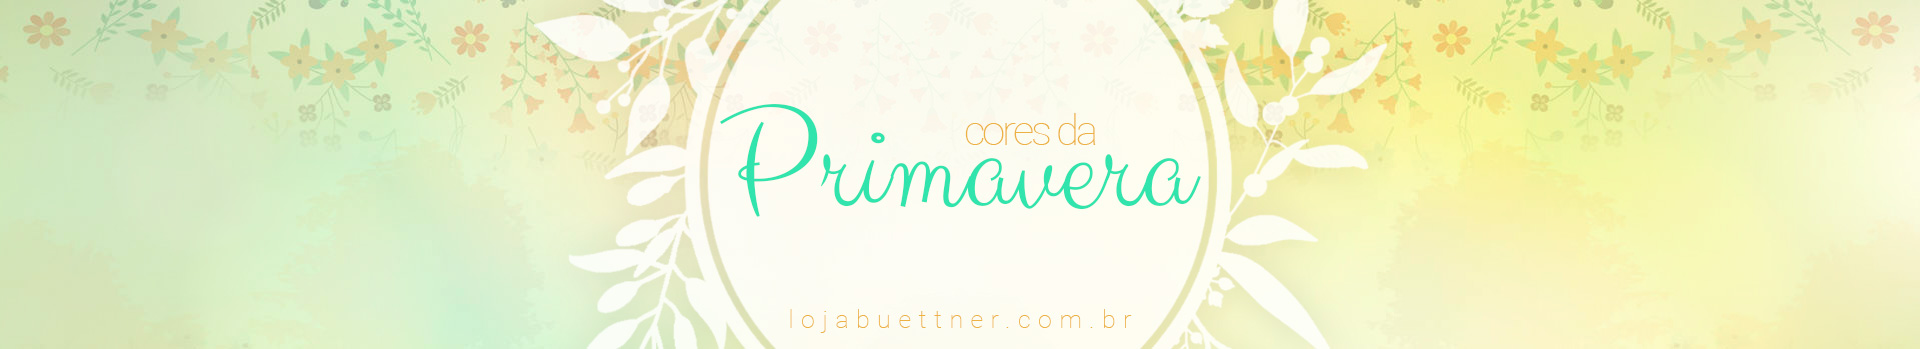 Banner Primavera